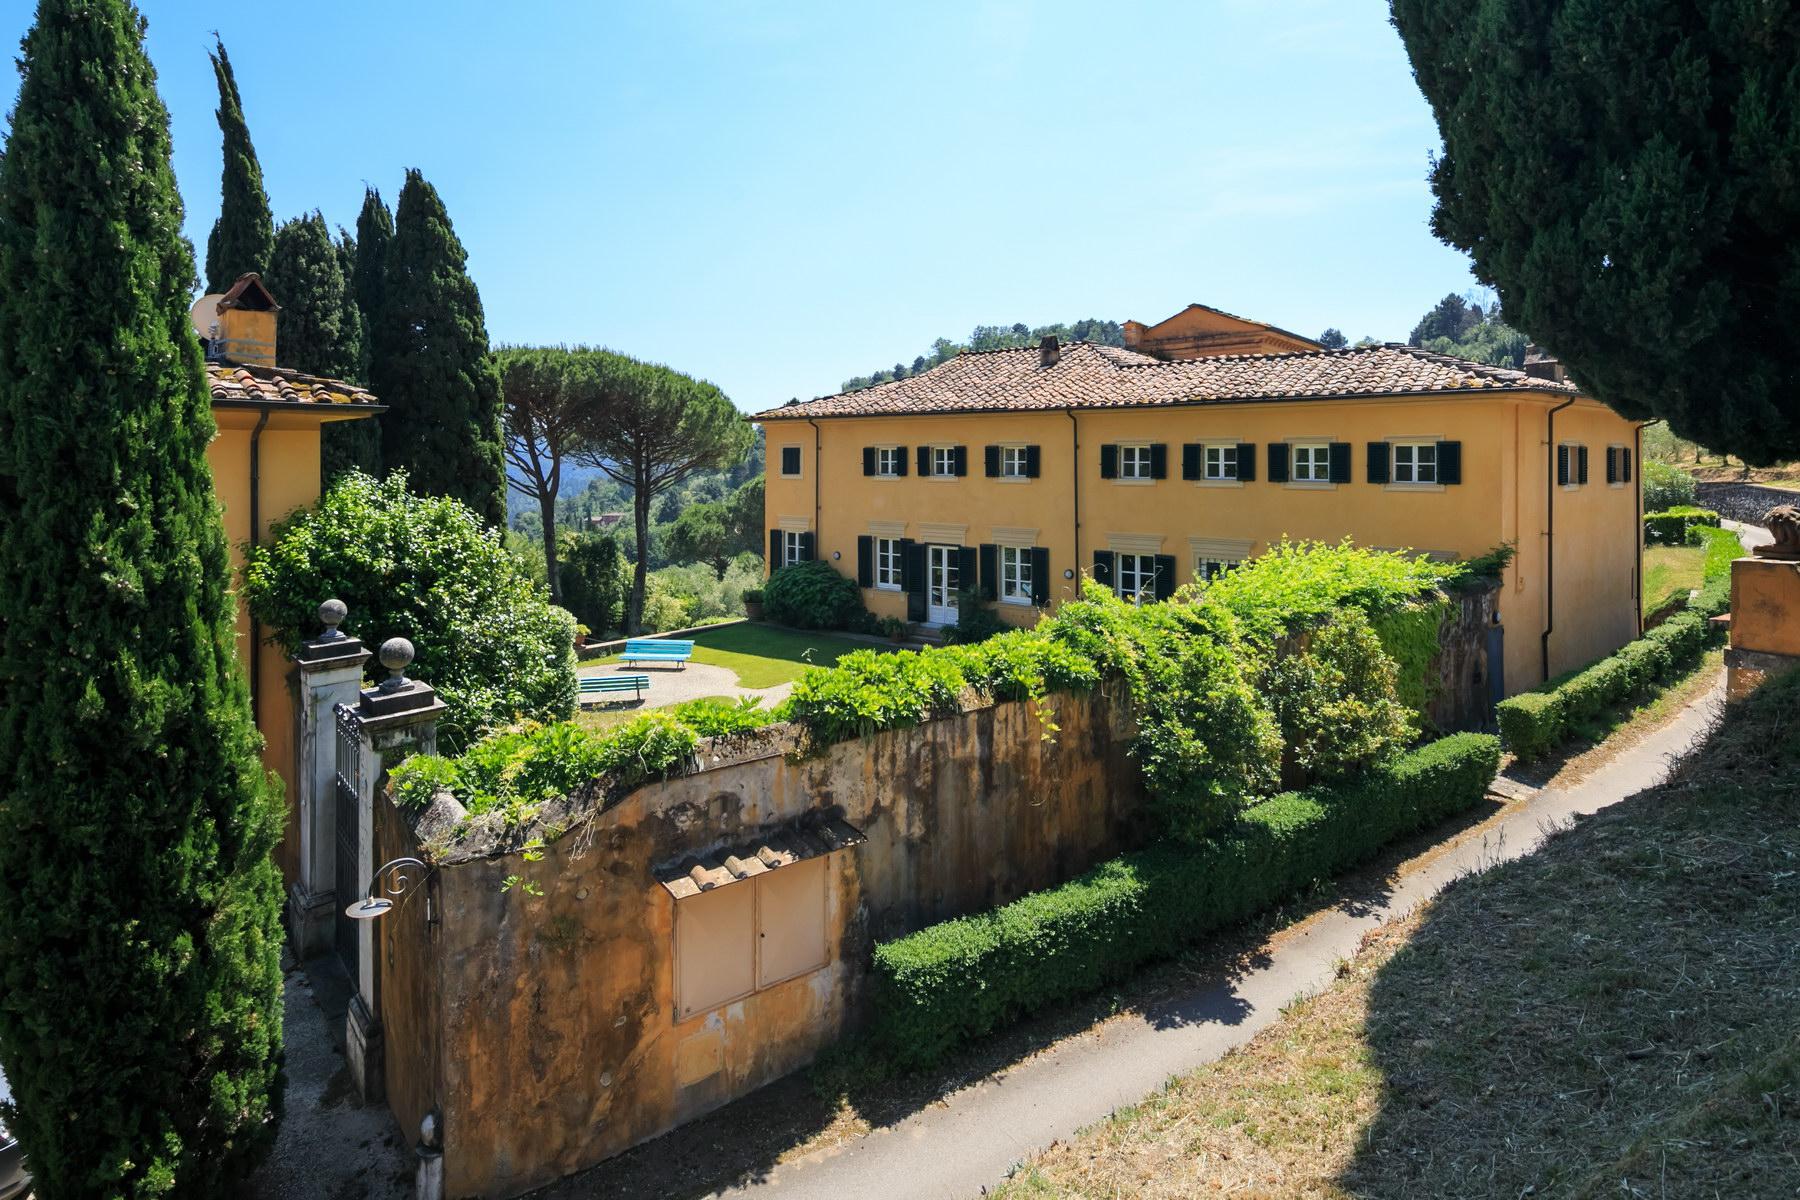 Villa in Vendita a Lucca: 5 locali, 1500 mq - Foto 18